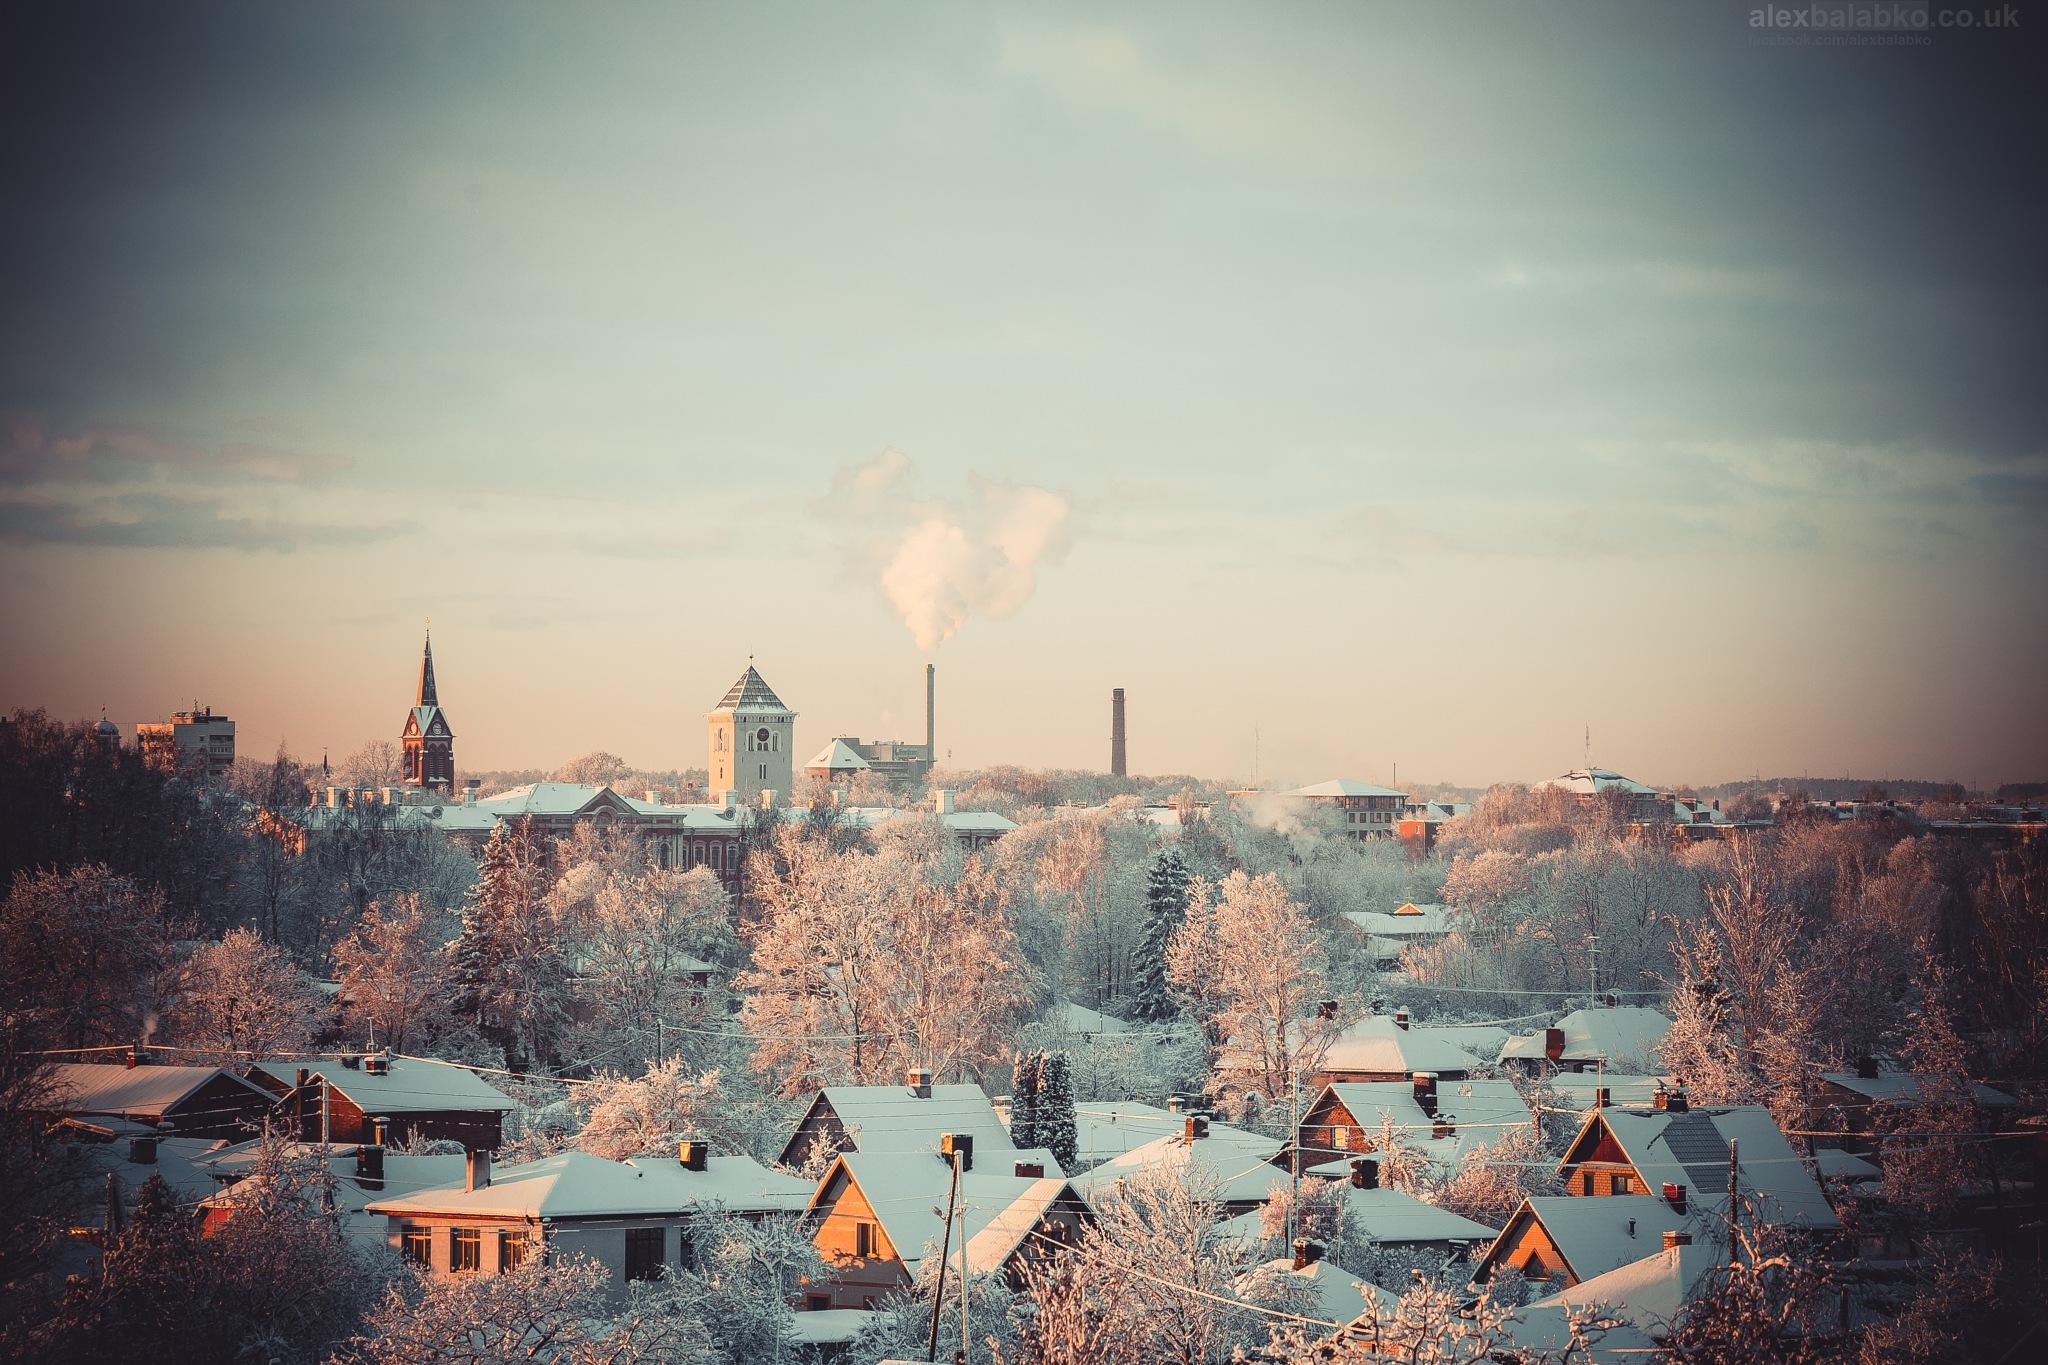 Jelgava by Alexandr Balabko